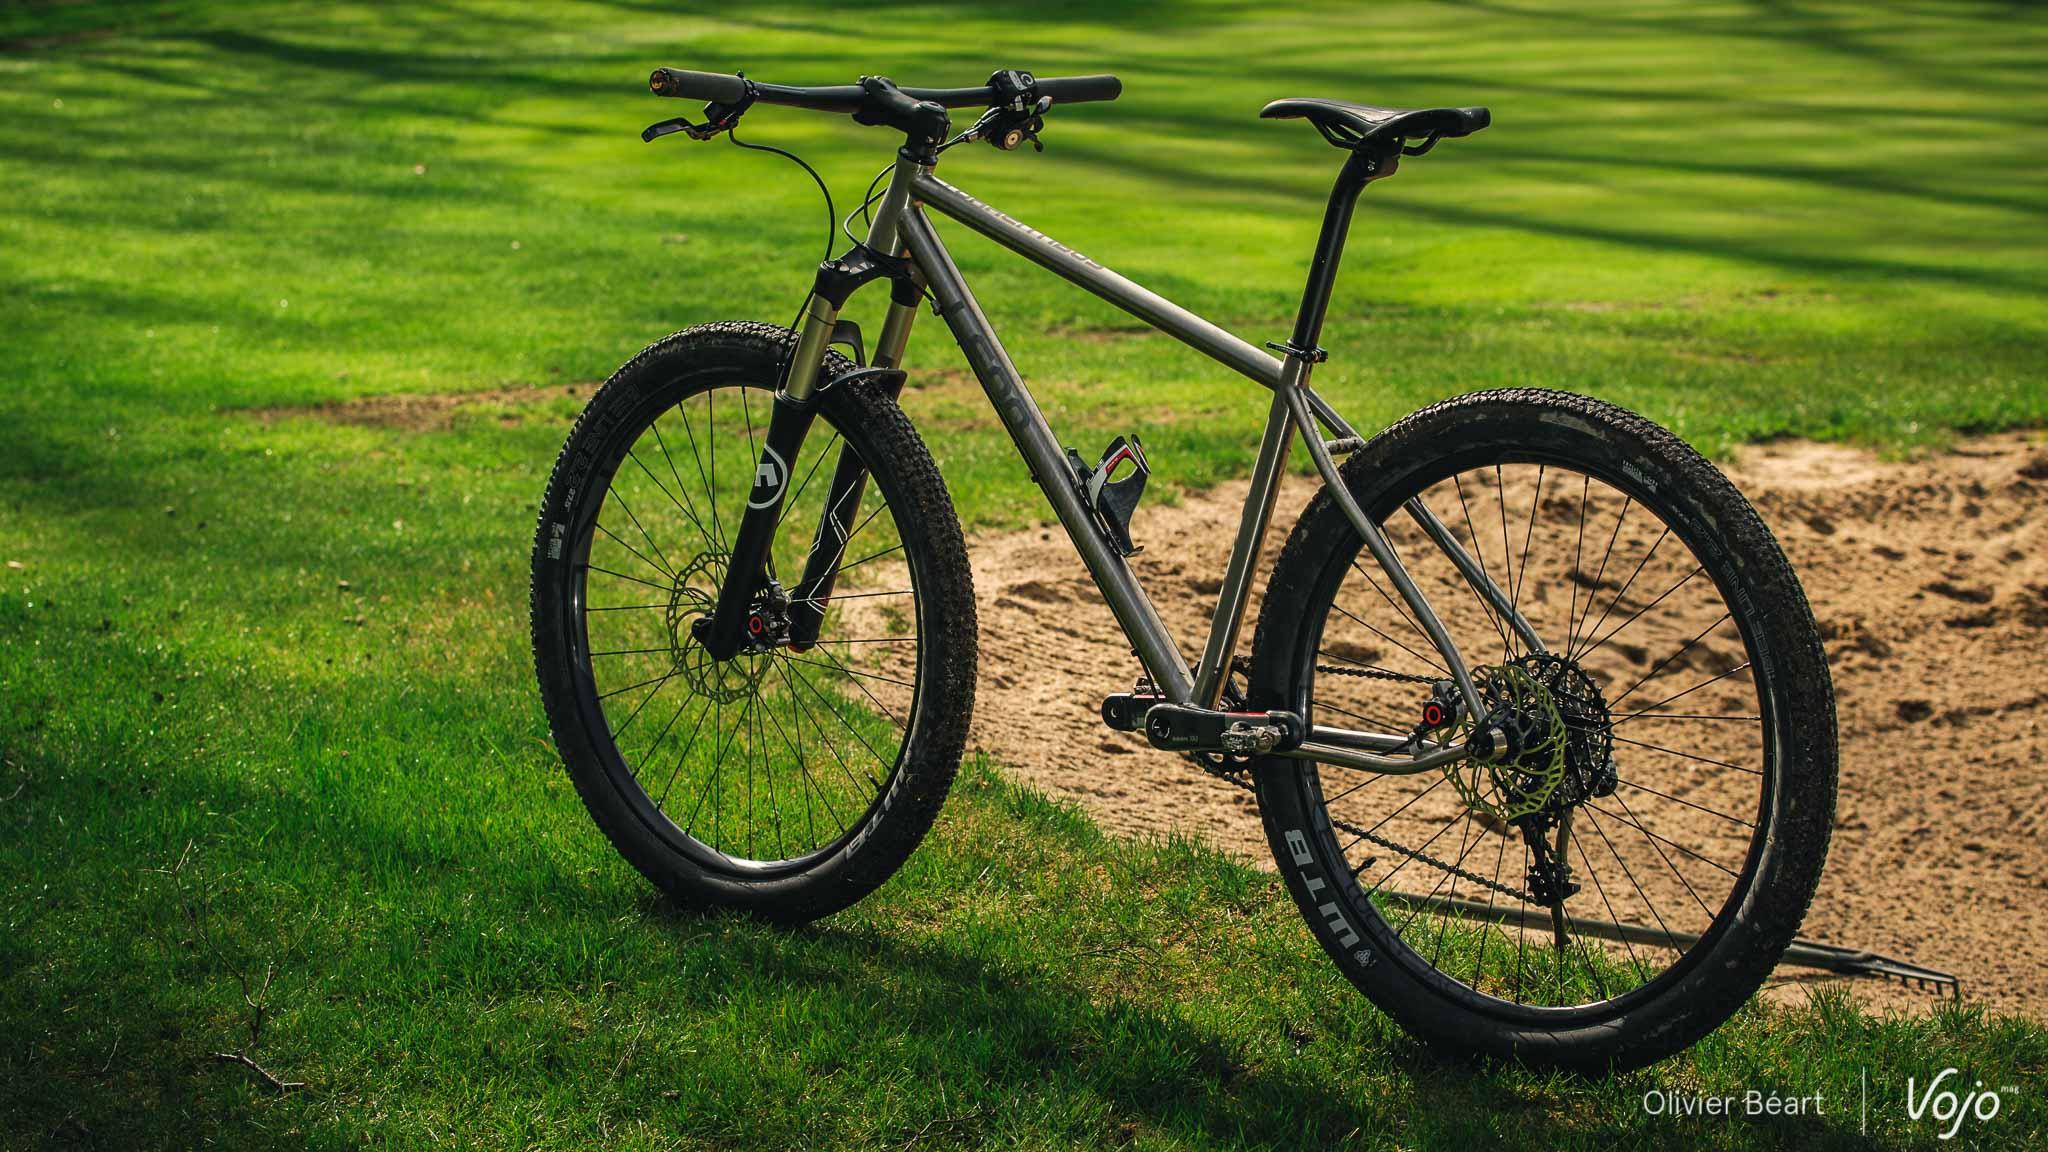 cycles_leon_decouverte_copyright_obeart_vojomag-18